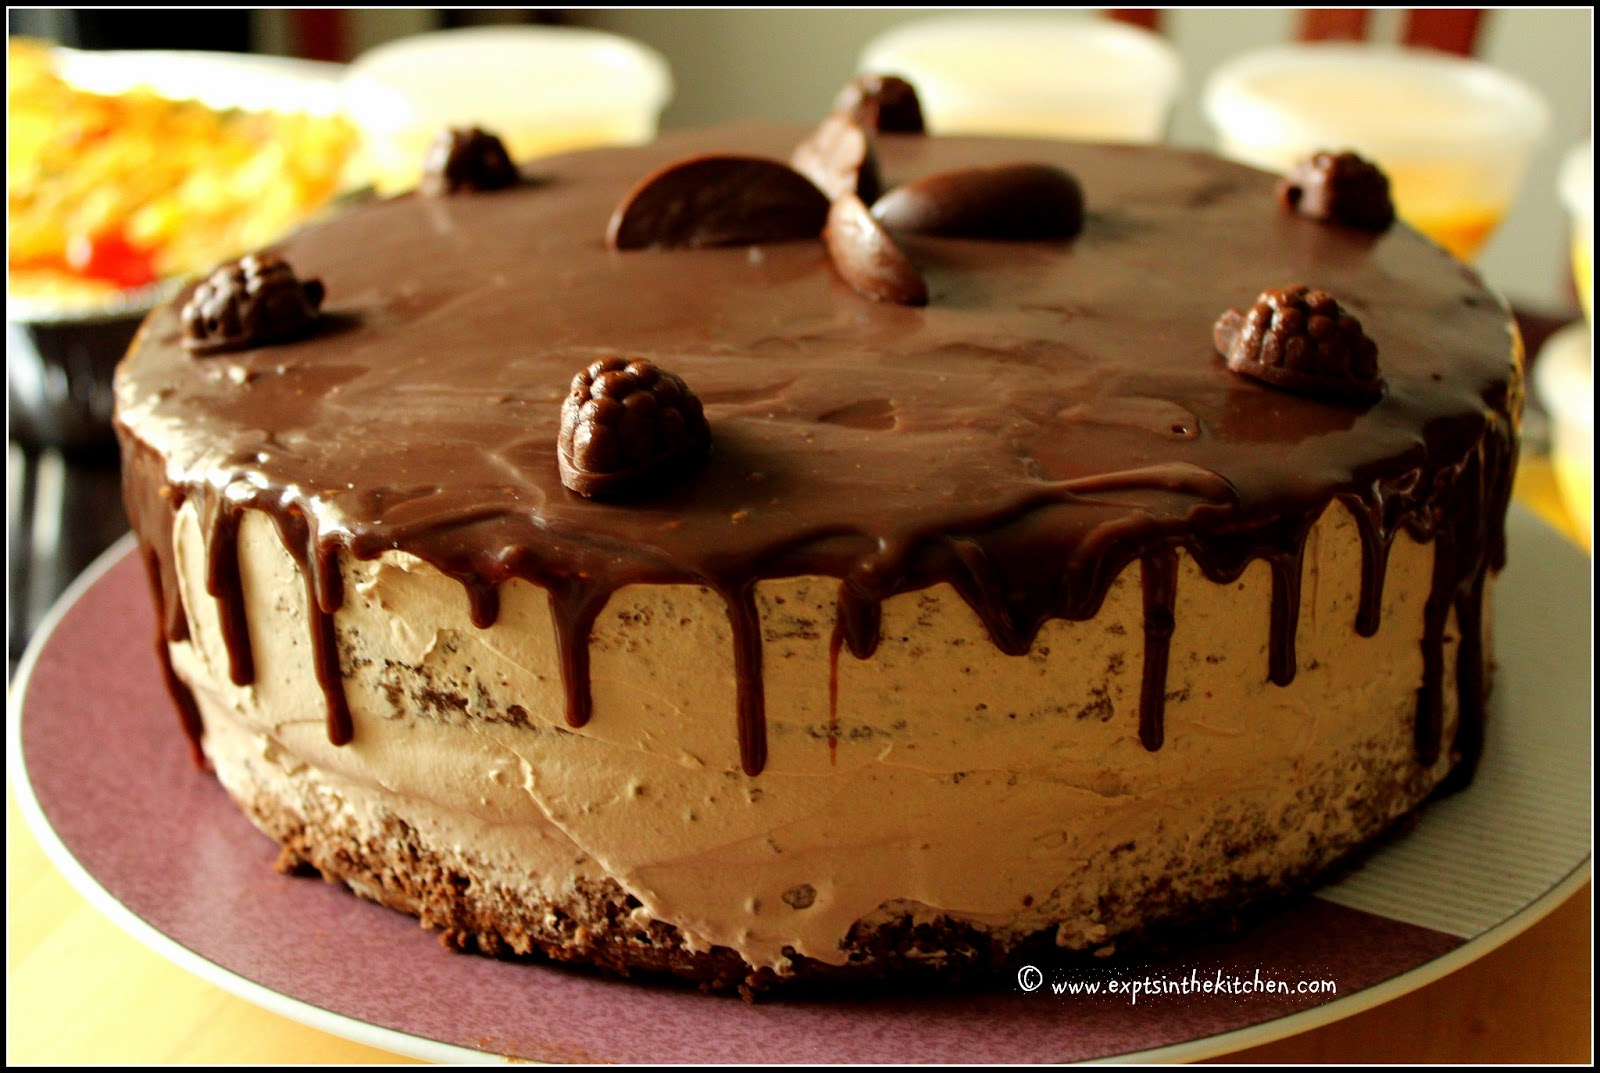 Chocolate Chiffon Cake With Whipped Cream Chocolate Chiffon Cake With